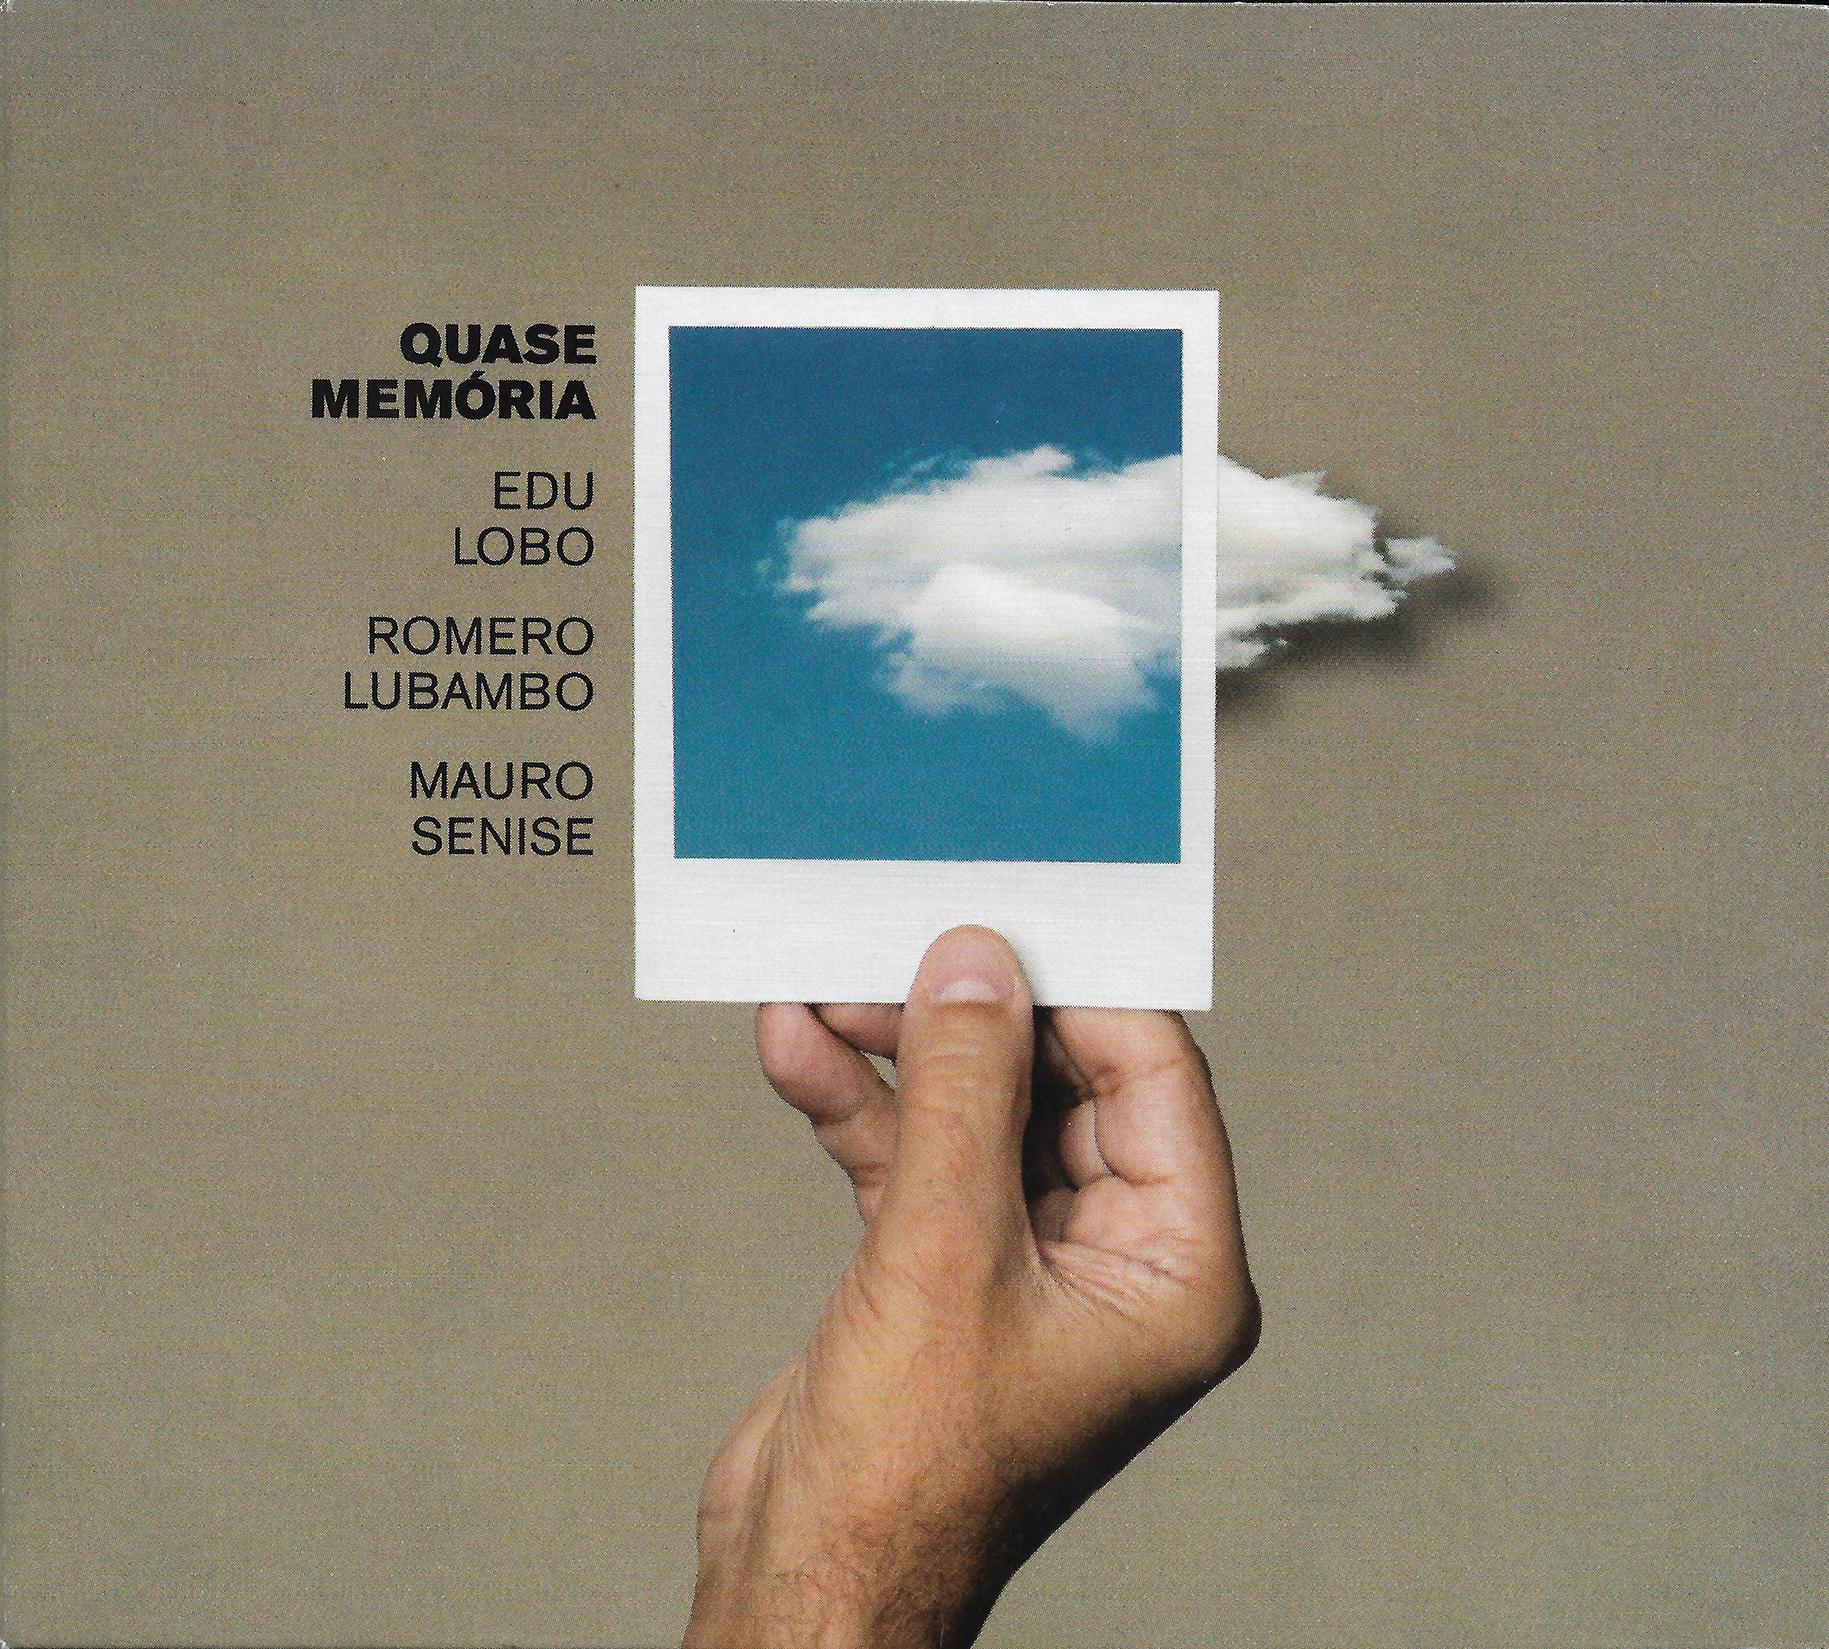 Capa CD Edu Lobo Romero Lubambo e Mauro Senise Quase Memória A certeza de ouvir música boa